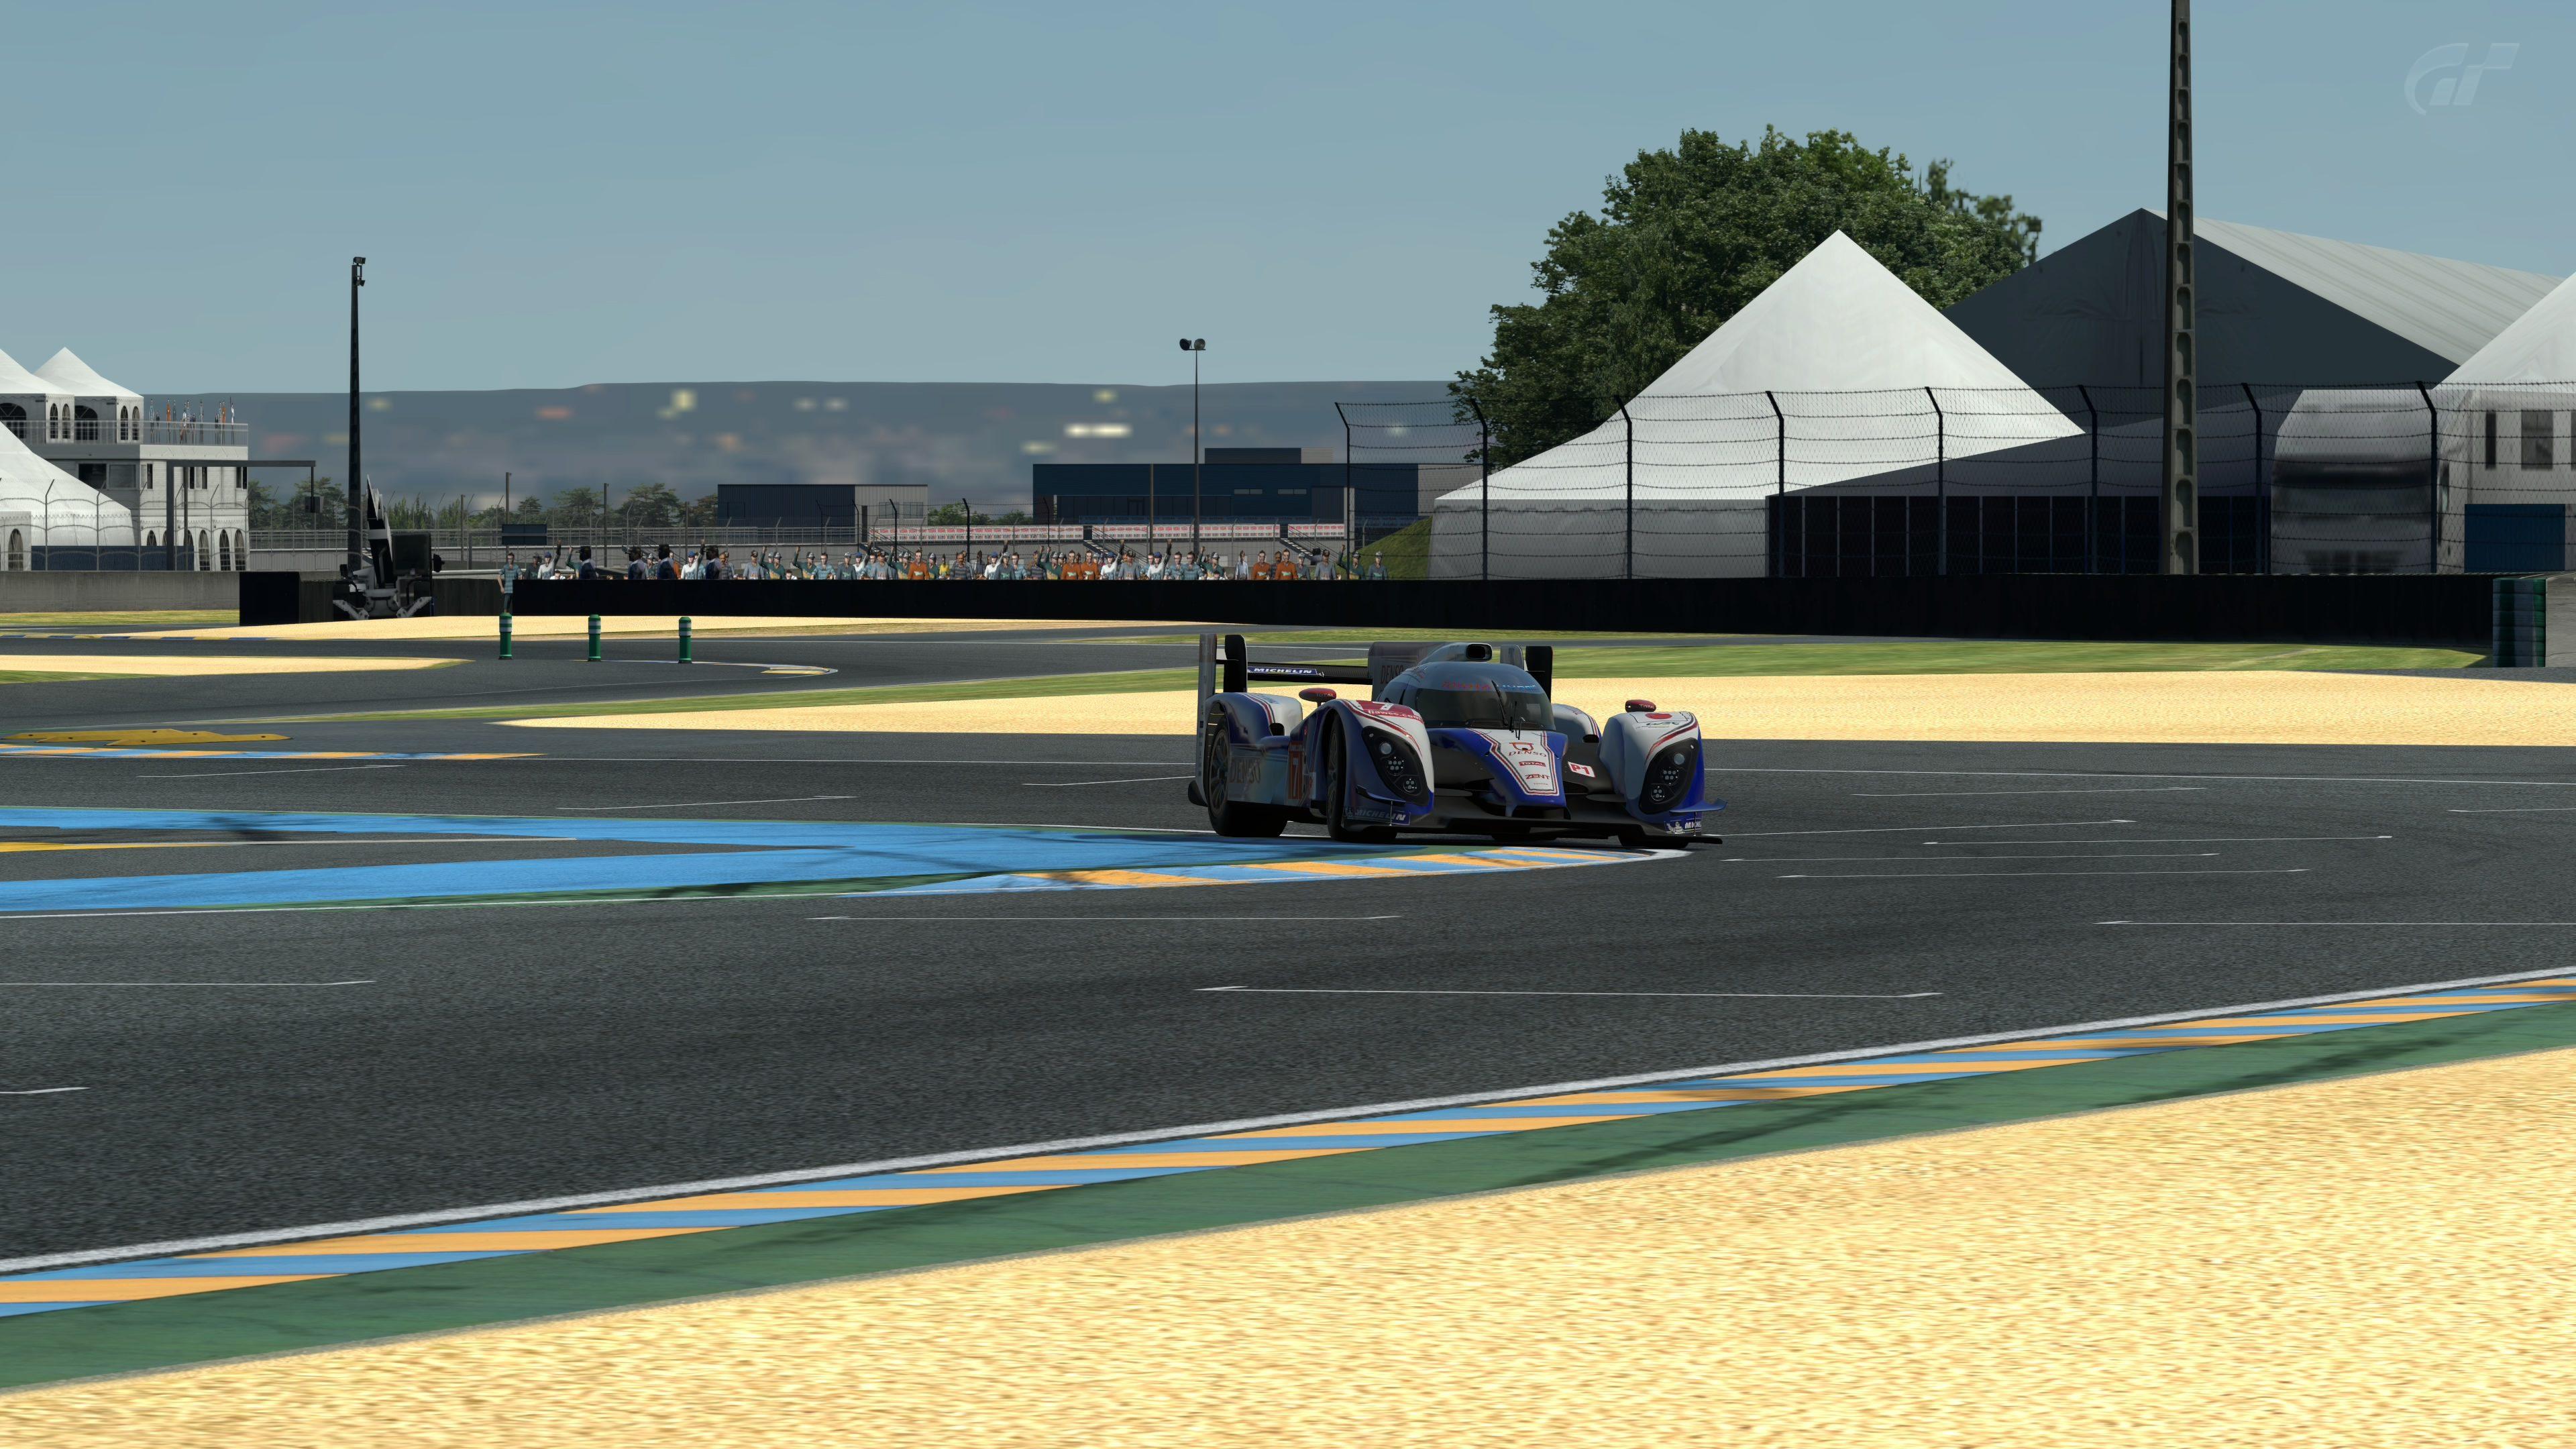 Circuit de la Sarthe 2013_12.jpg